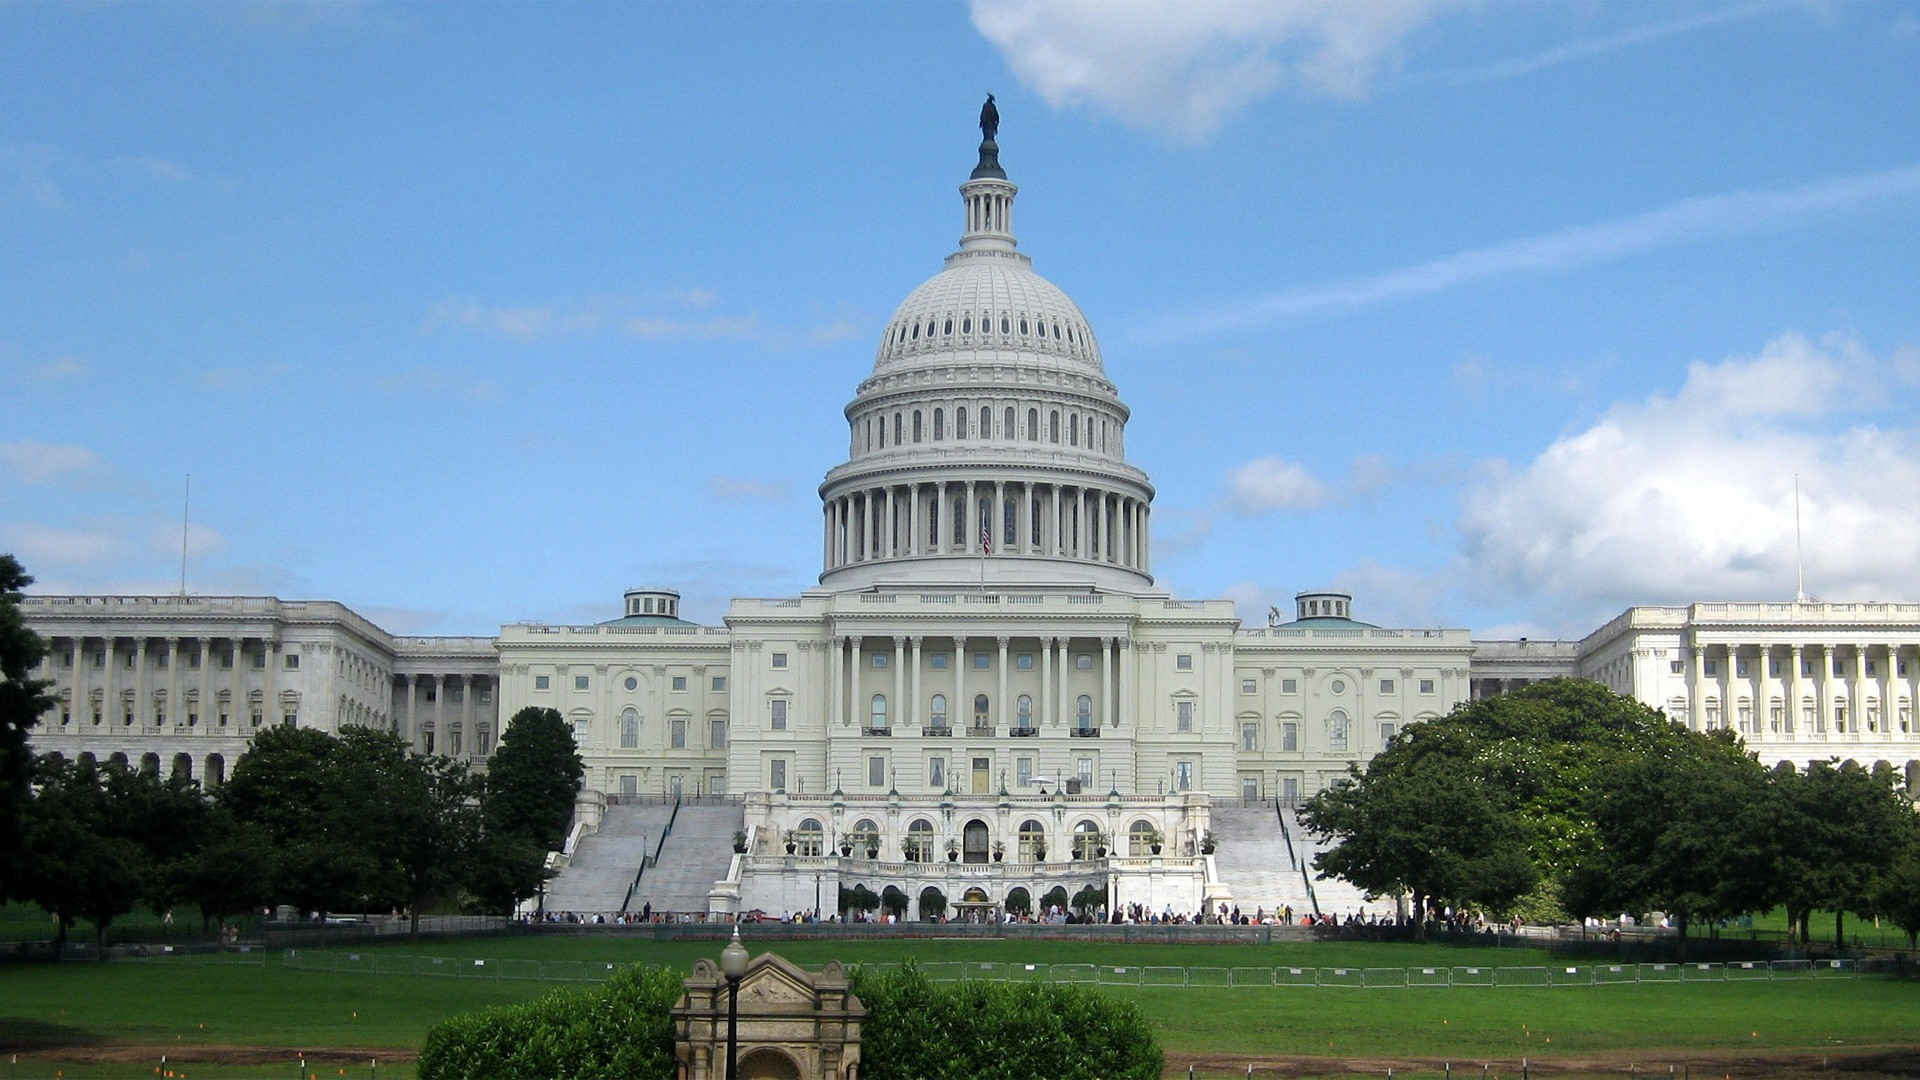 United States Capitol Wallpaper 7   1920 X 1080 stmednet 1920x1080